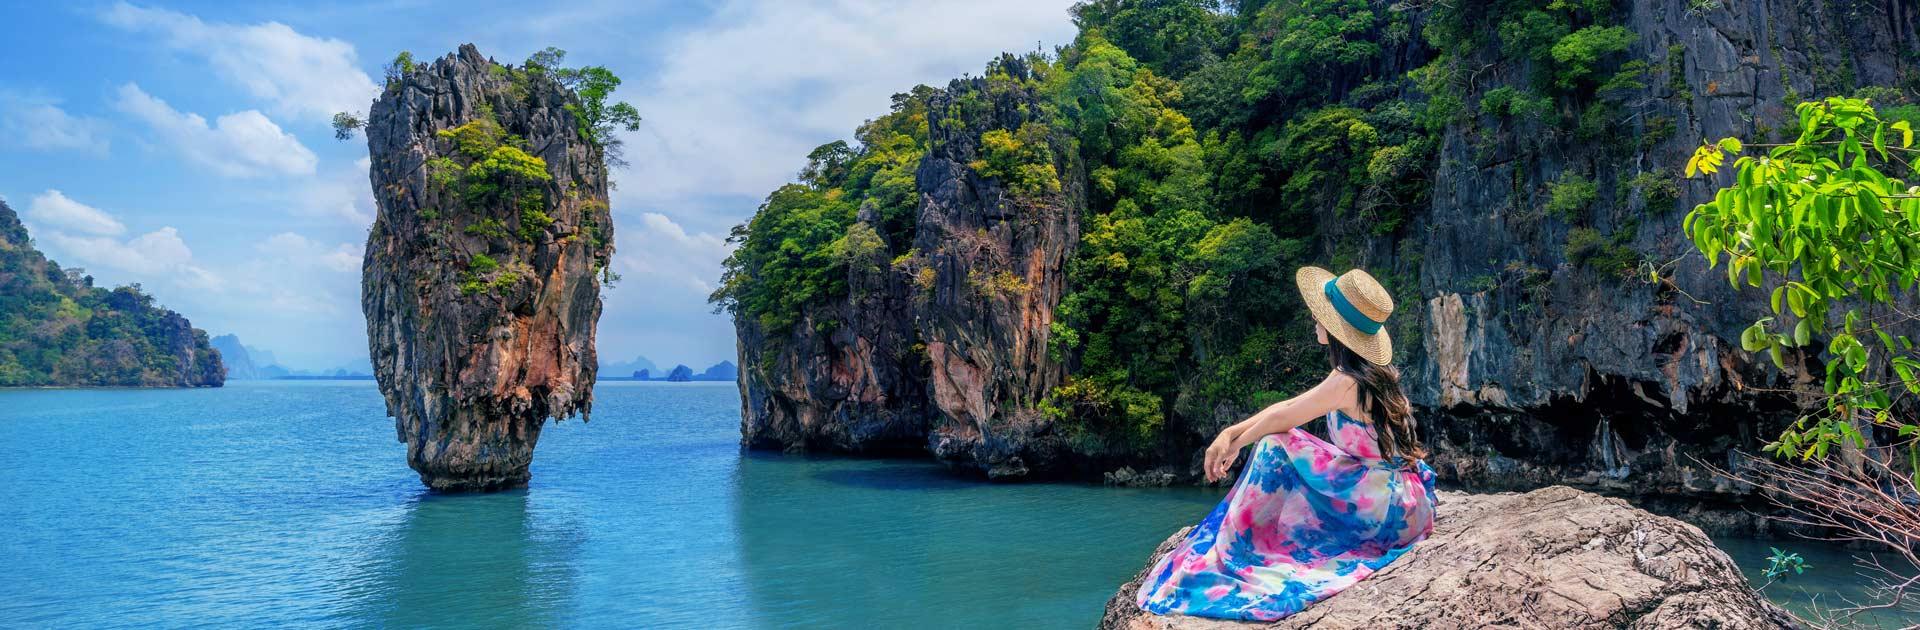 Viajar a Phuket en verano